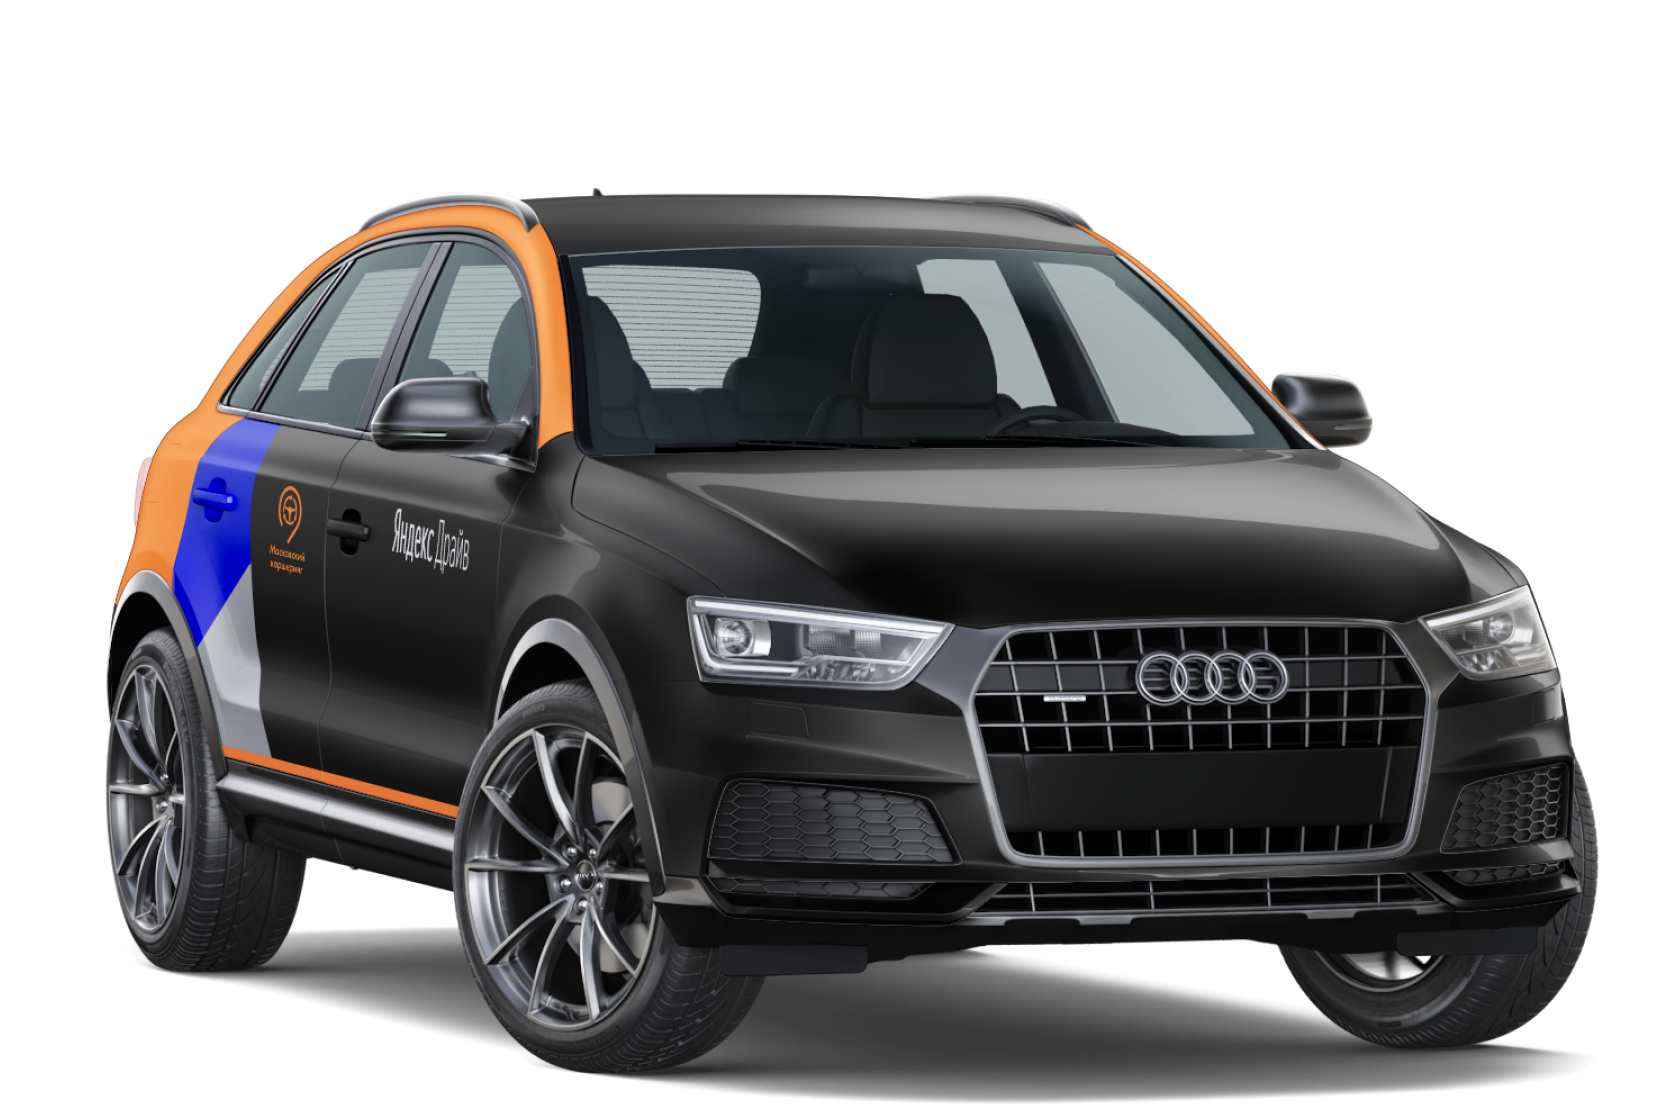 Audi<br>Q3